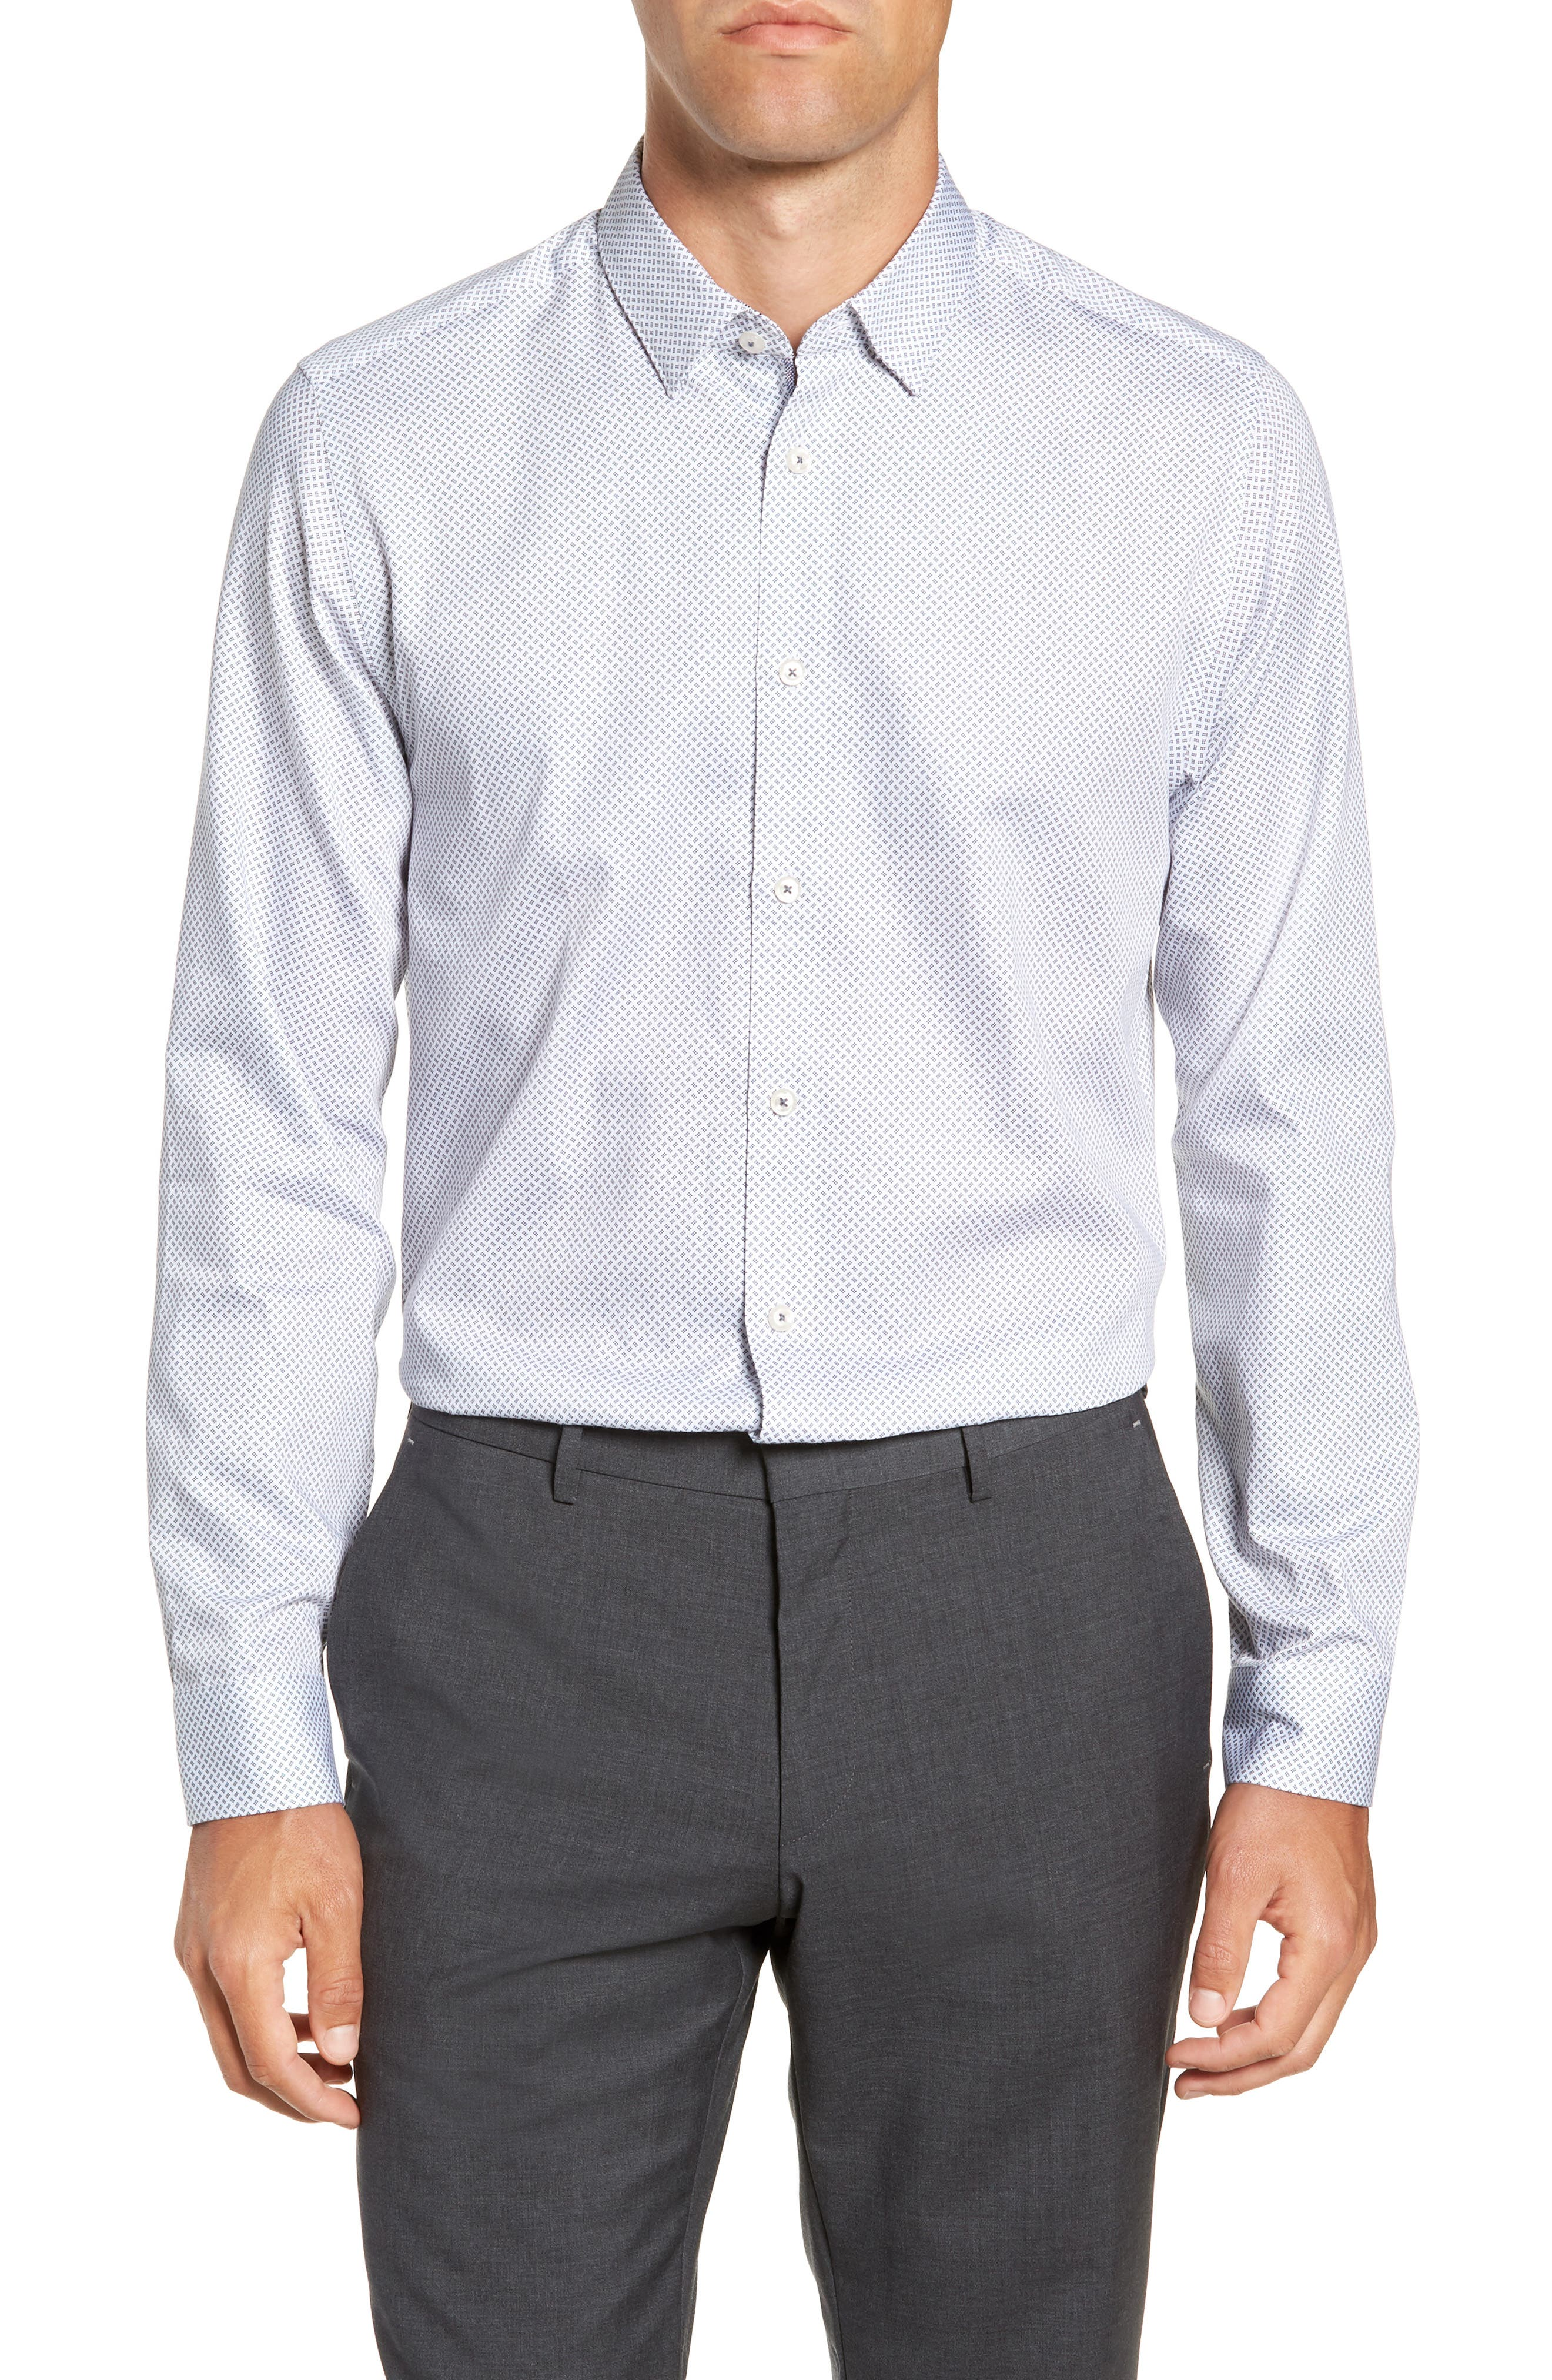 Aspara Modern Fit Geometric Dress Shirt,                             Main thumbnail 1, color,                             WHITE/ NAVY